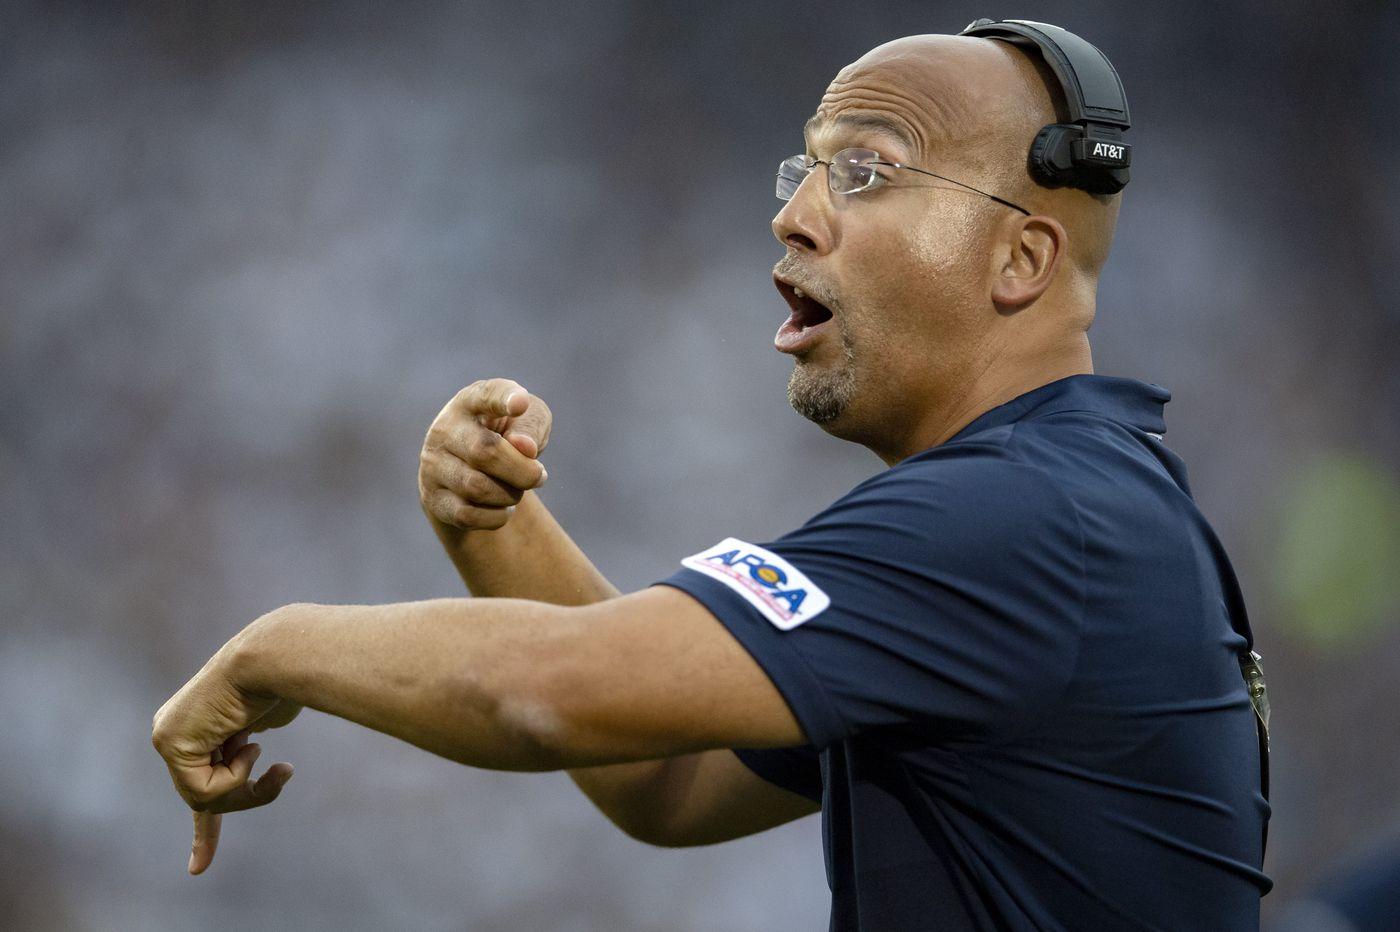 Predicting Penn State's Big Ten opener at Illinois